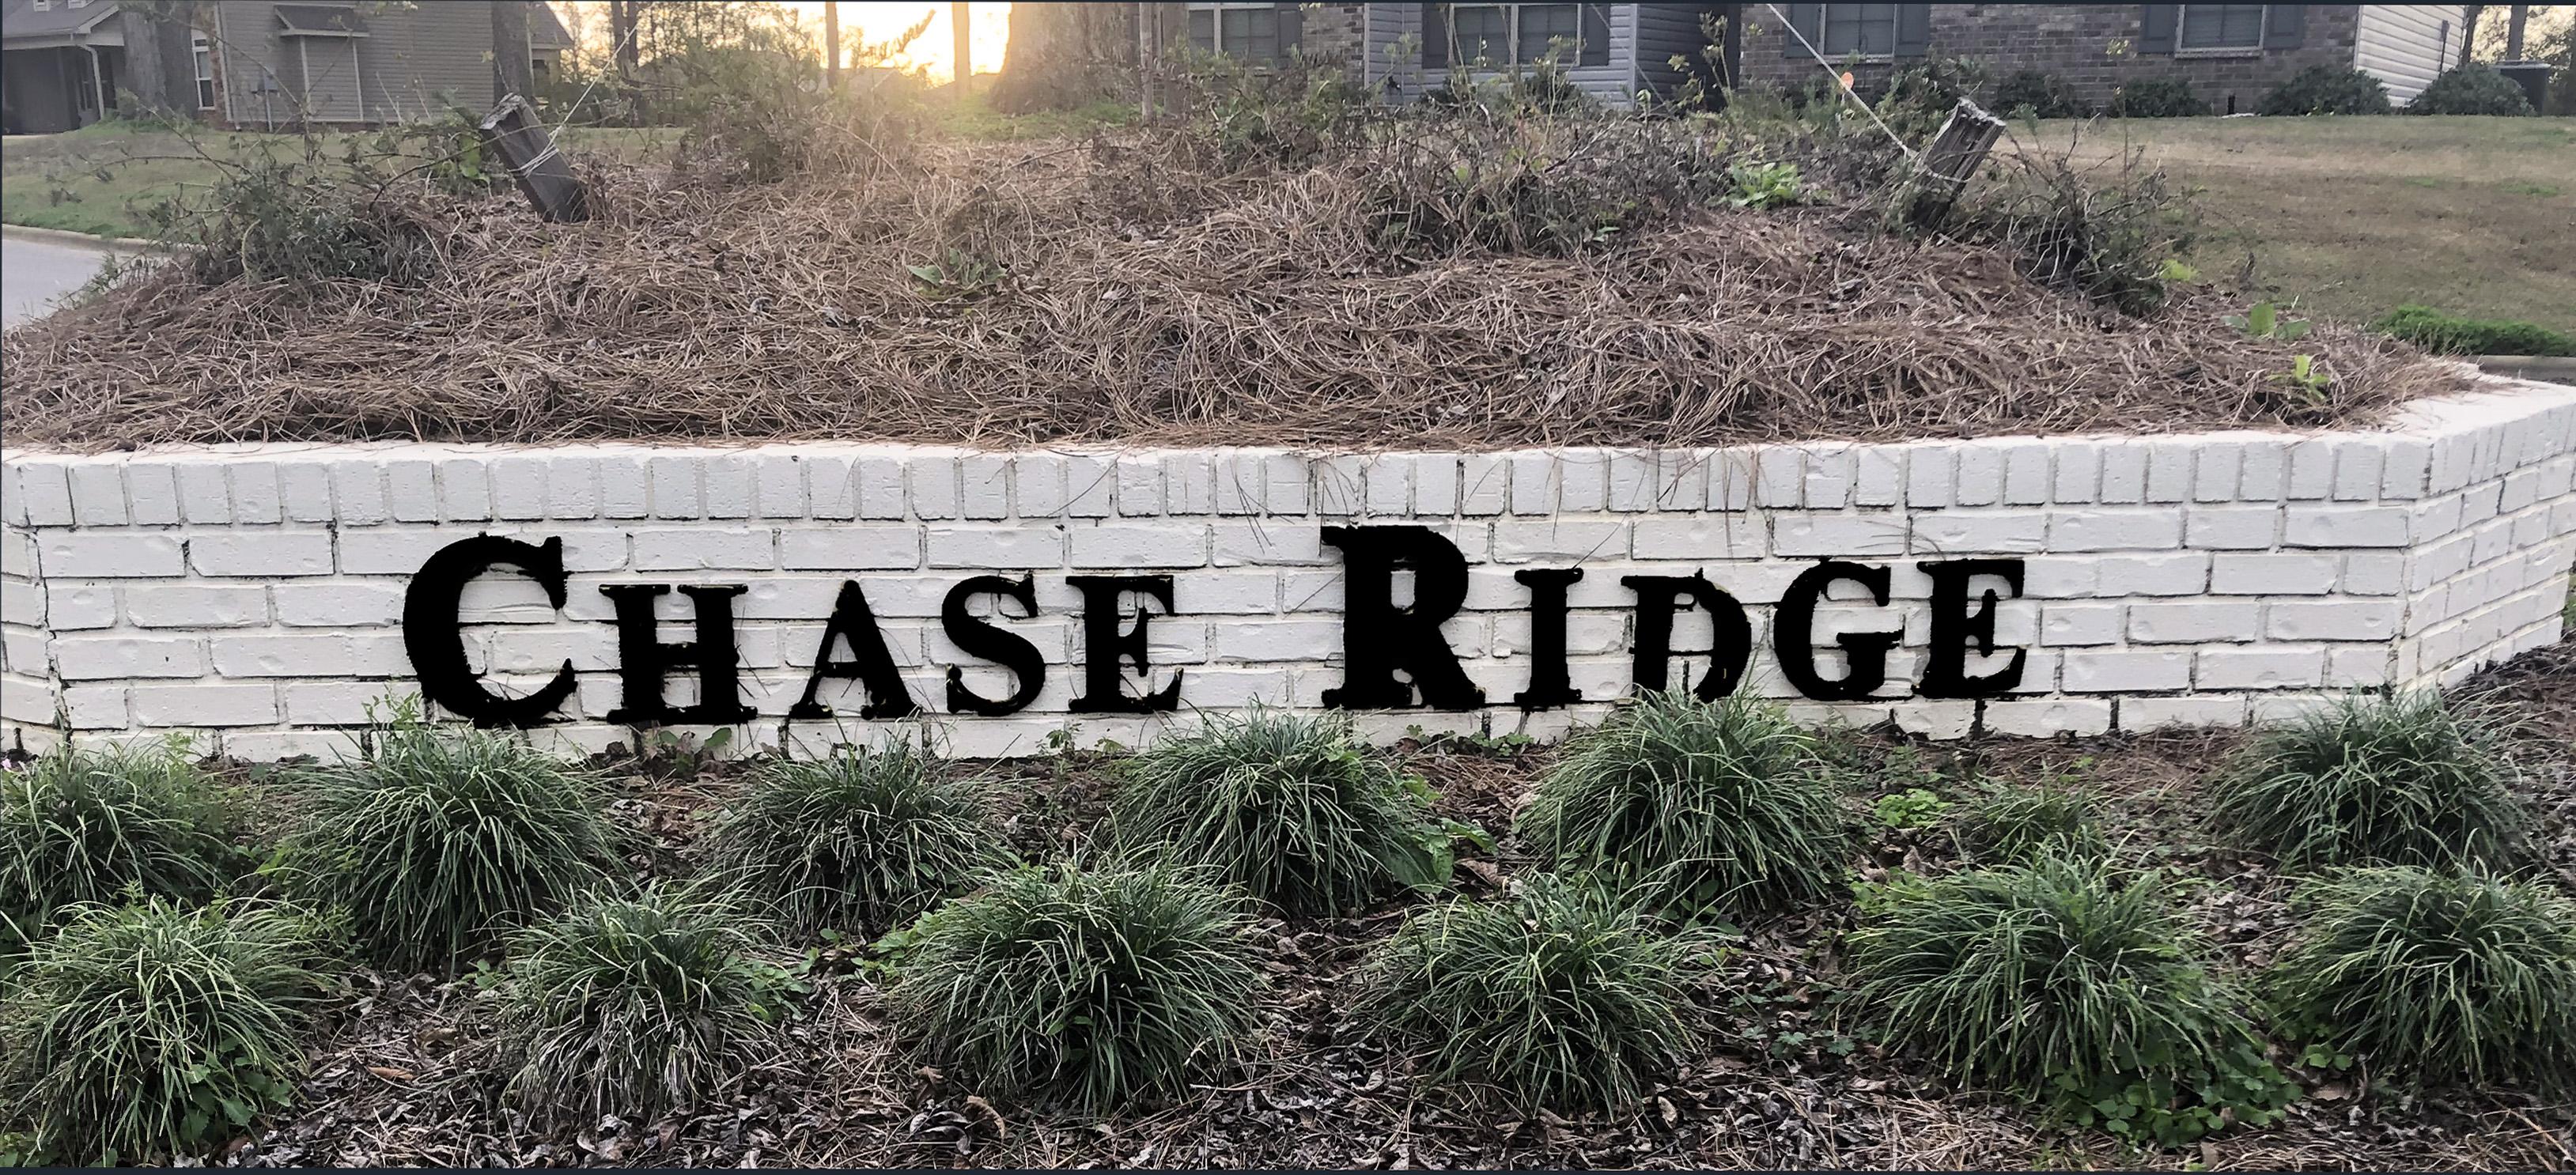 Chase Entrance